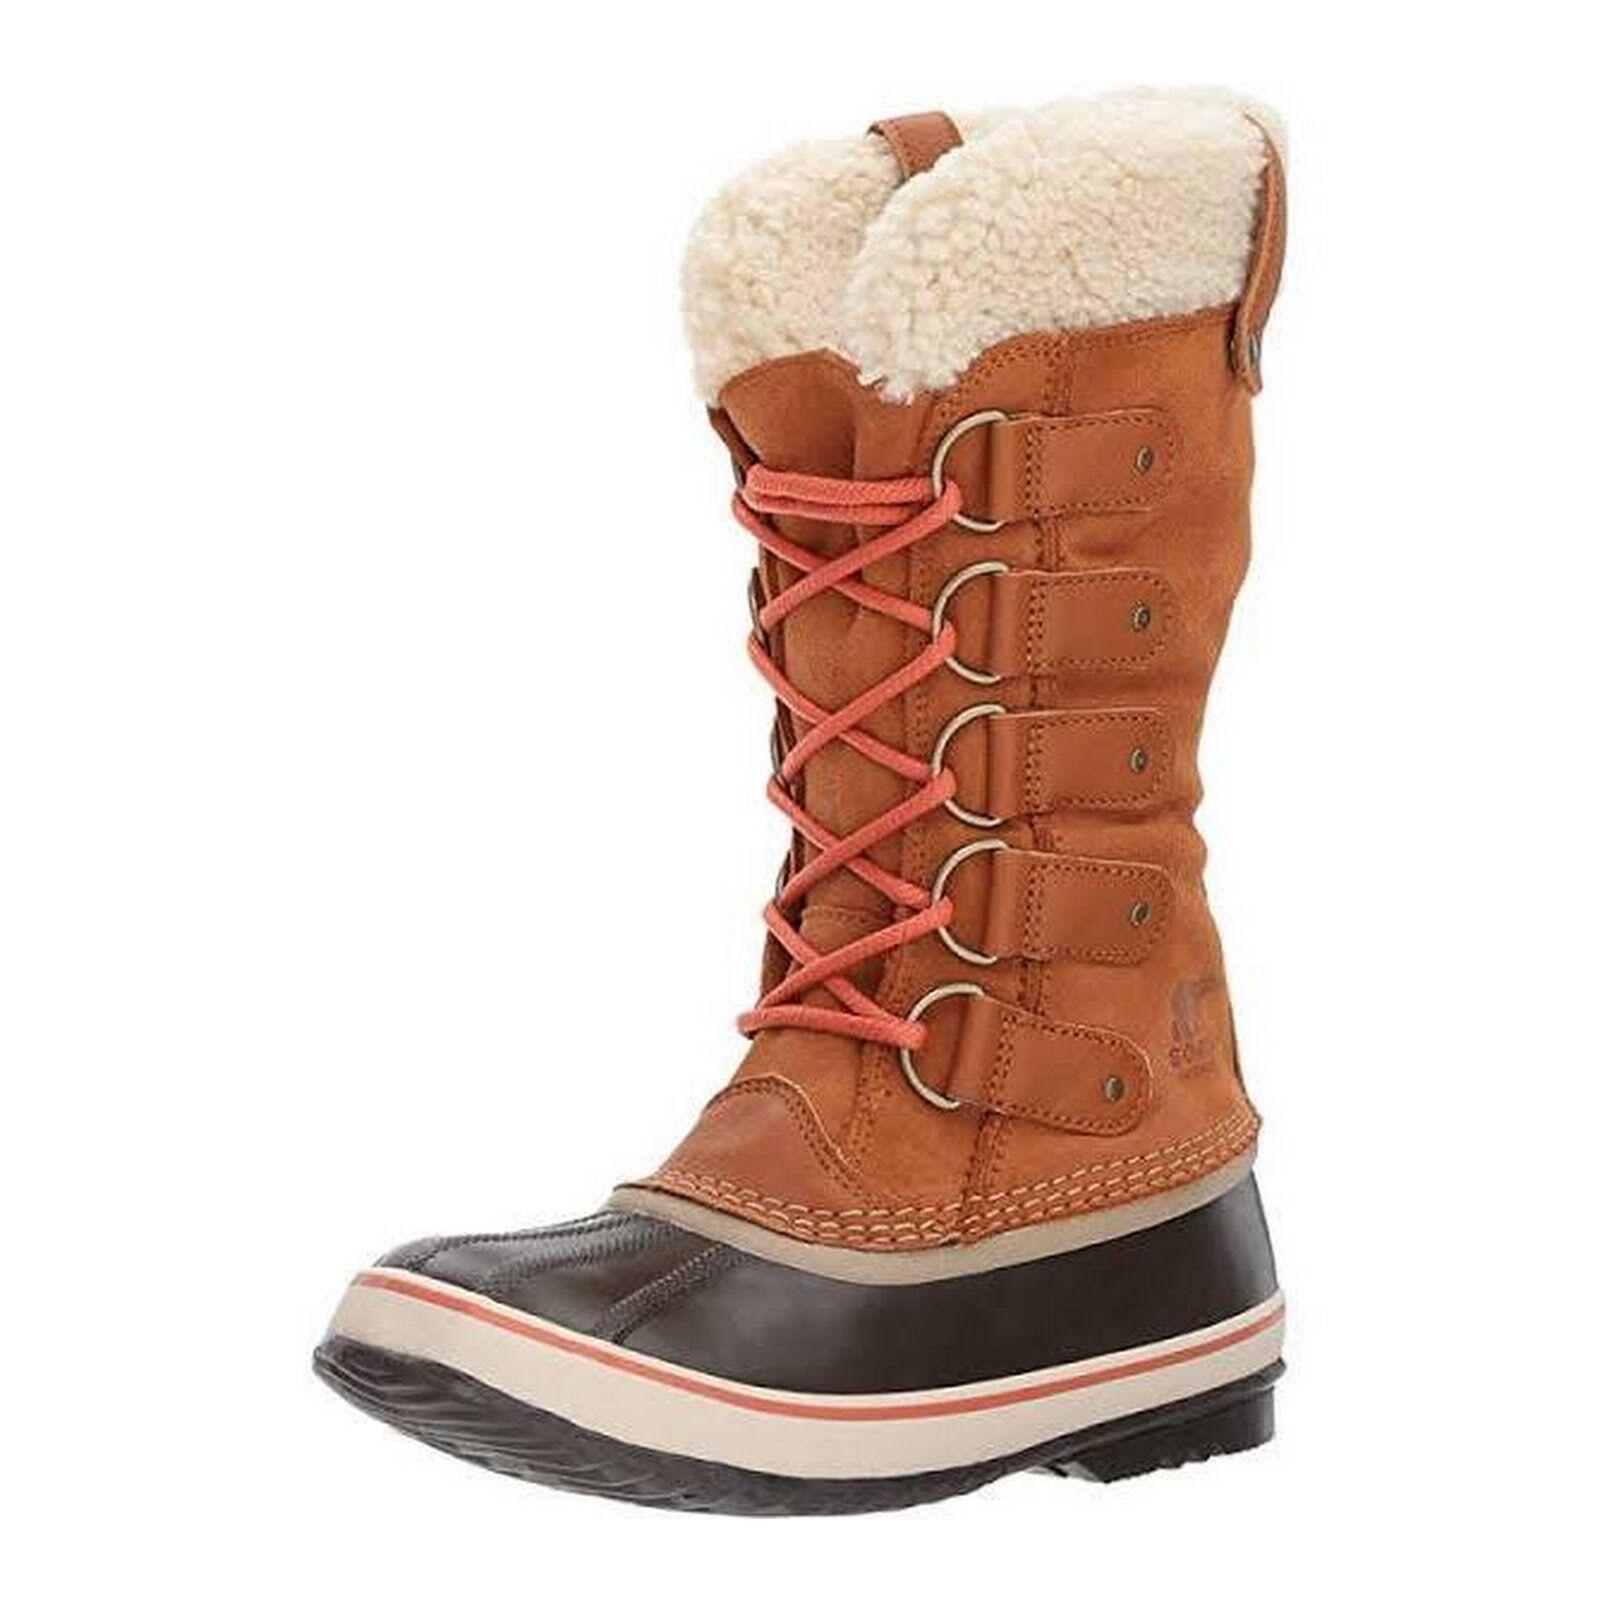 Sorel Joan of of of Arctic Shearing Caramel Nectar Winter Snow Stiefel damen Größe 9.5 32f125